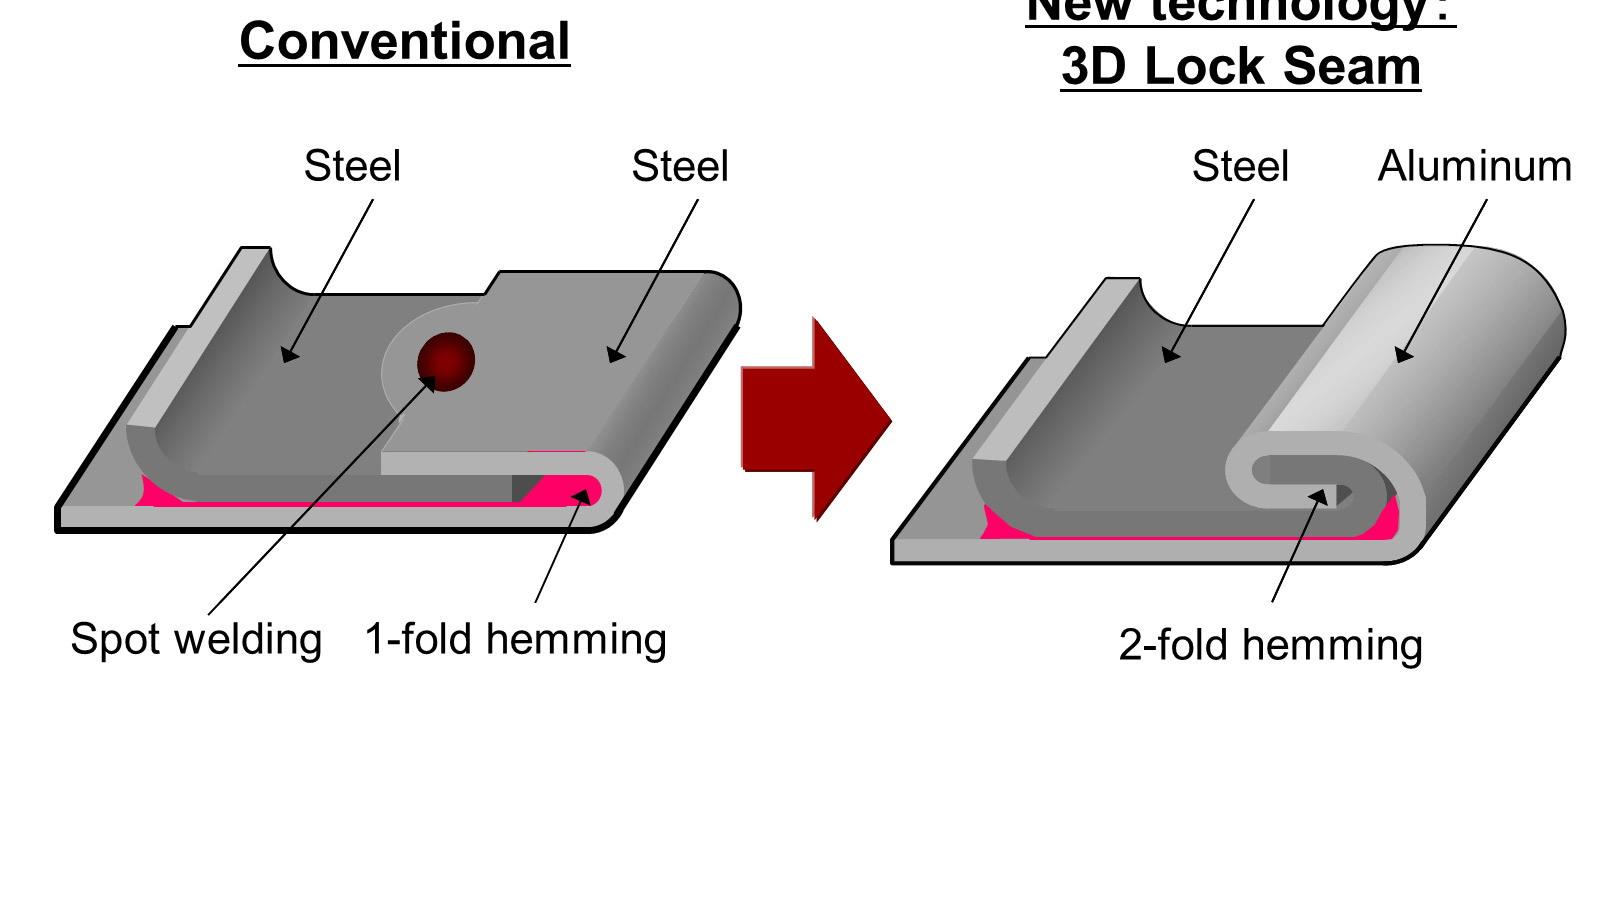 Acura's new aluminum to steel welding technology